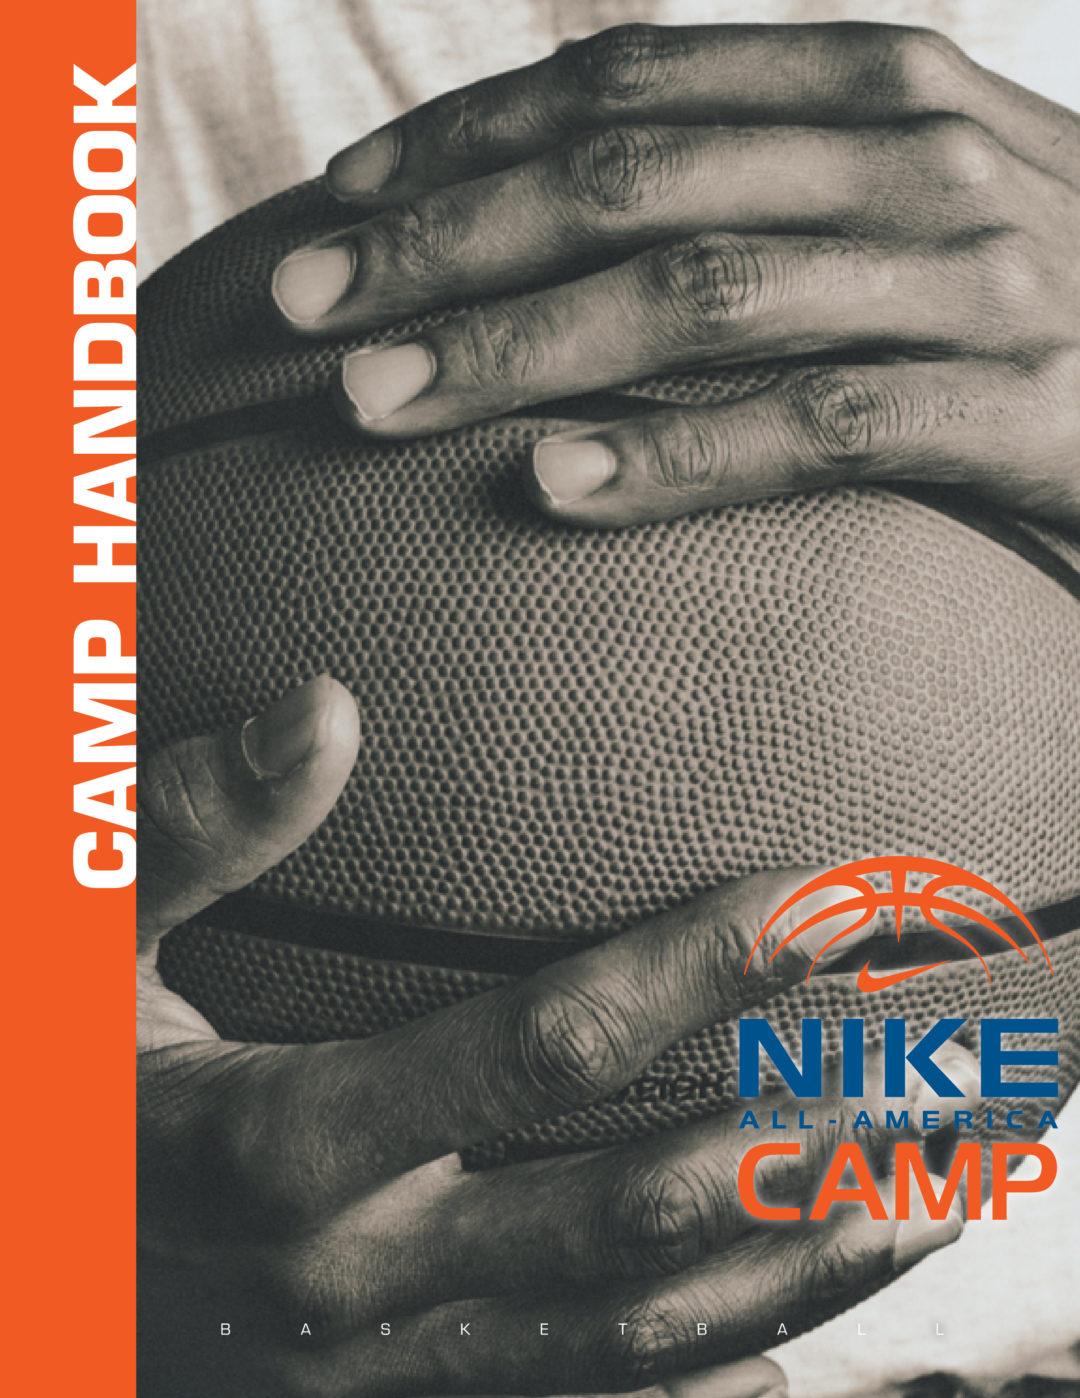 Nike 1999 Camp Handbook Cover